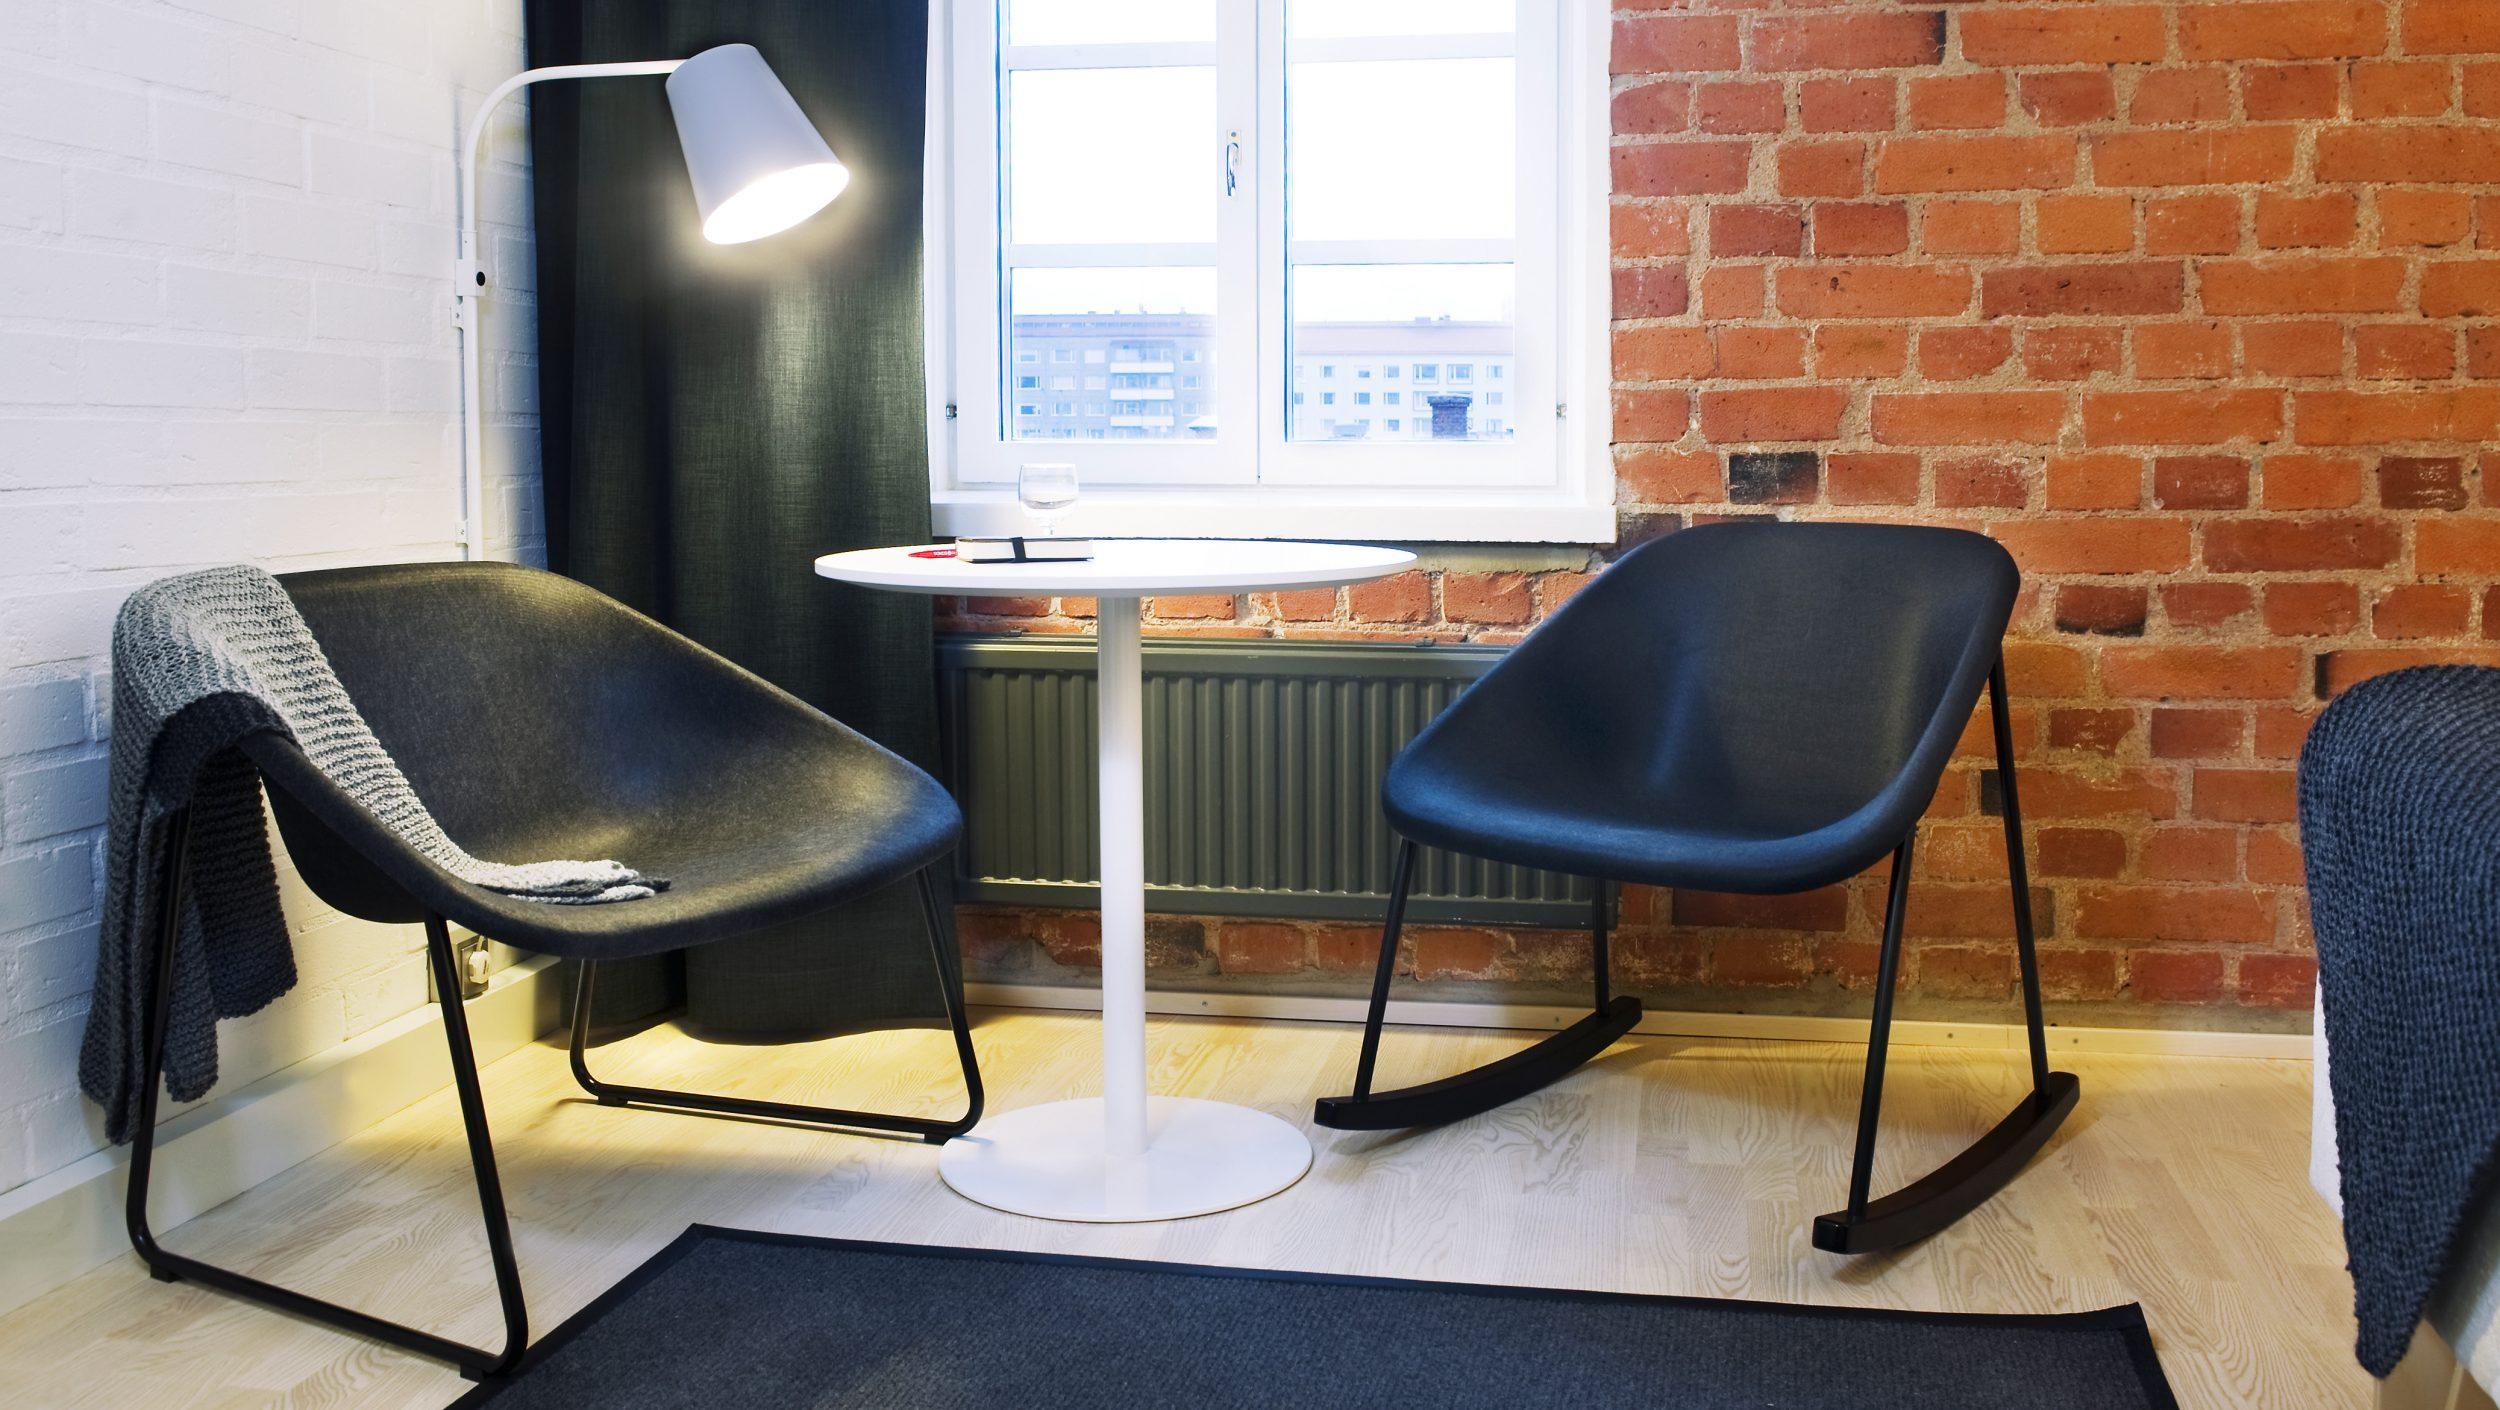 Sokos_Hotel_Villa_Tampere_GI_project